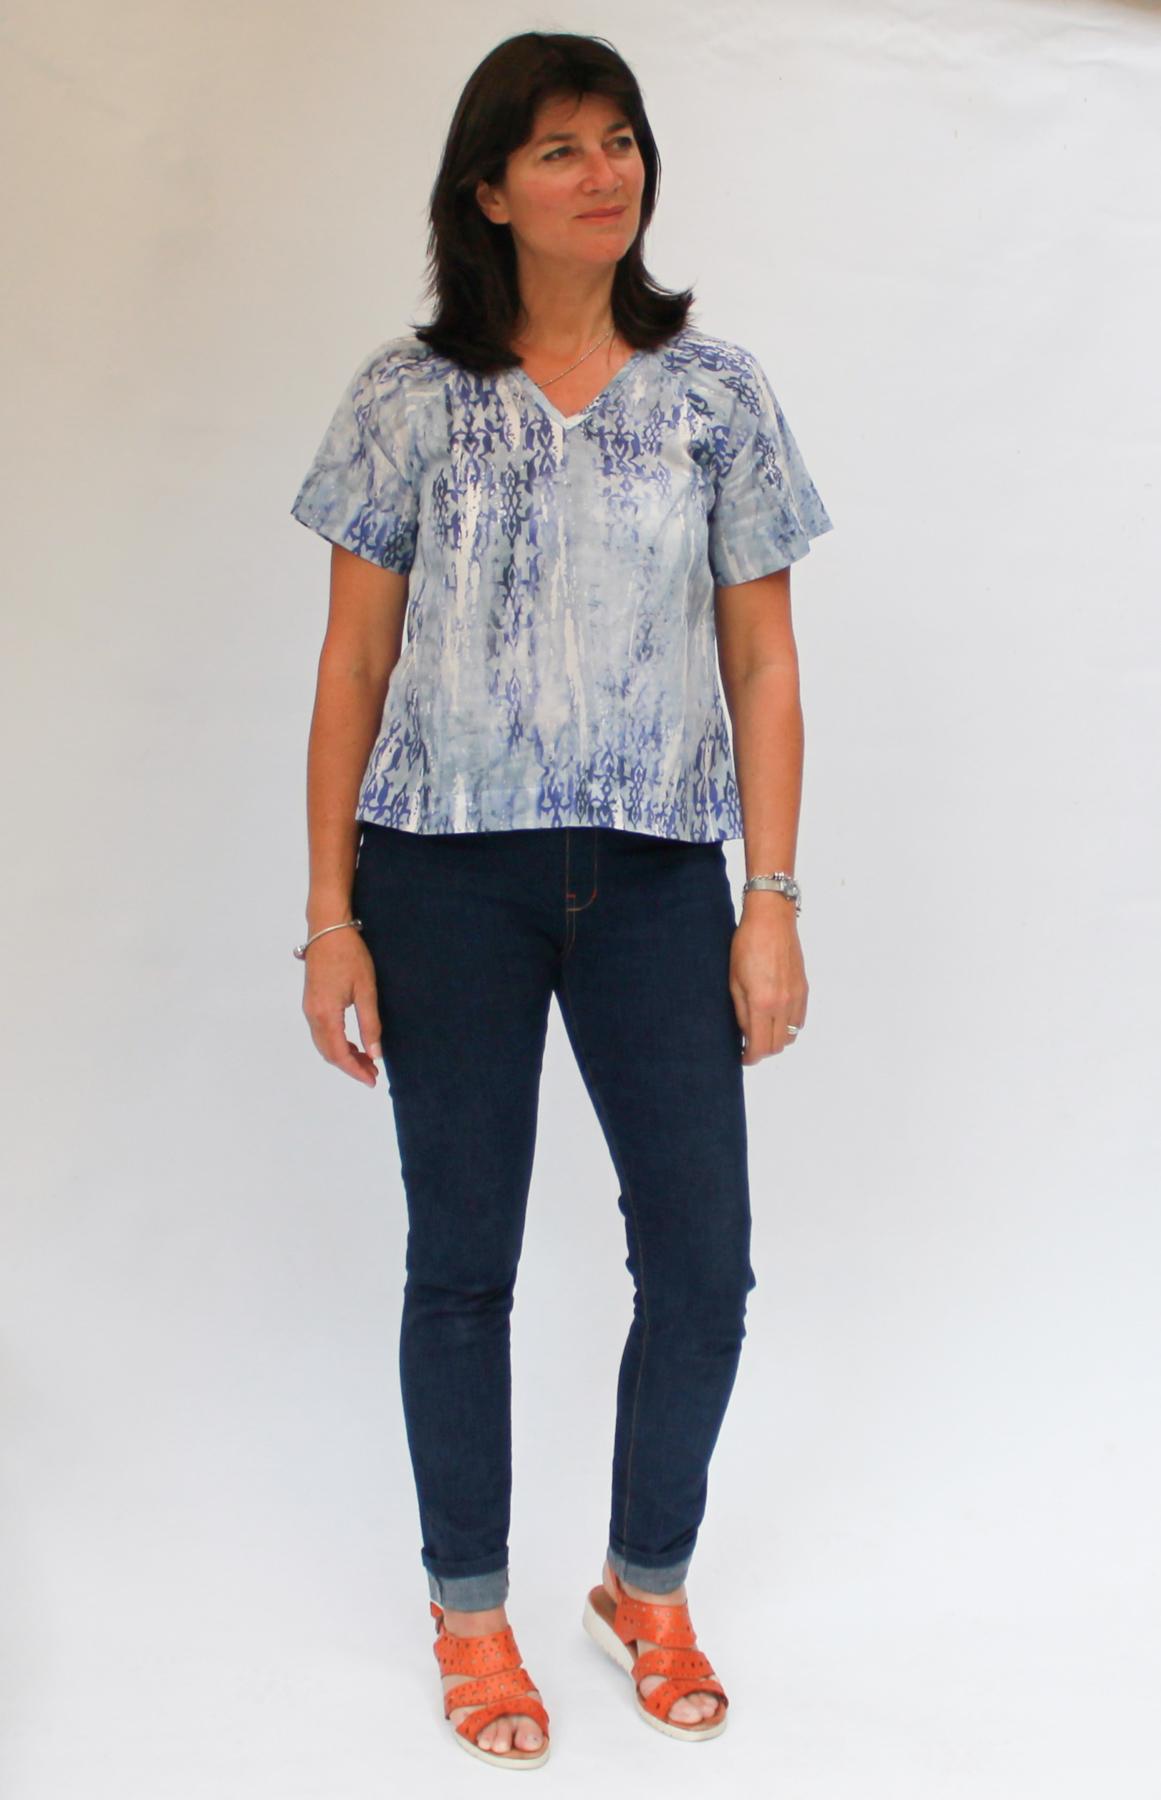 River dress & top pattern tester roundup! Megan Nielsen Design Diary